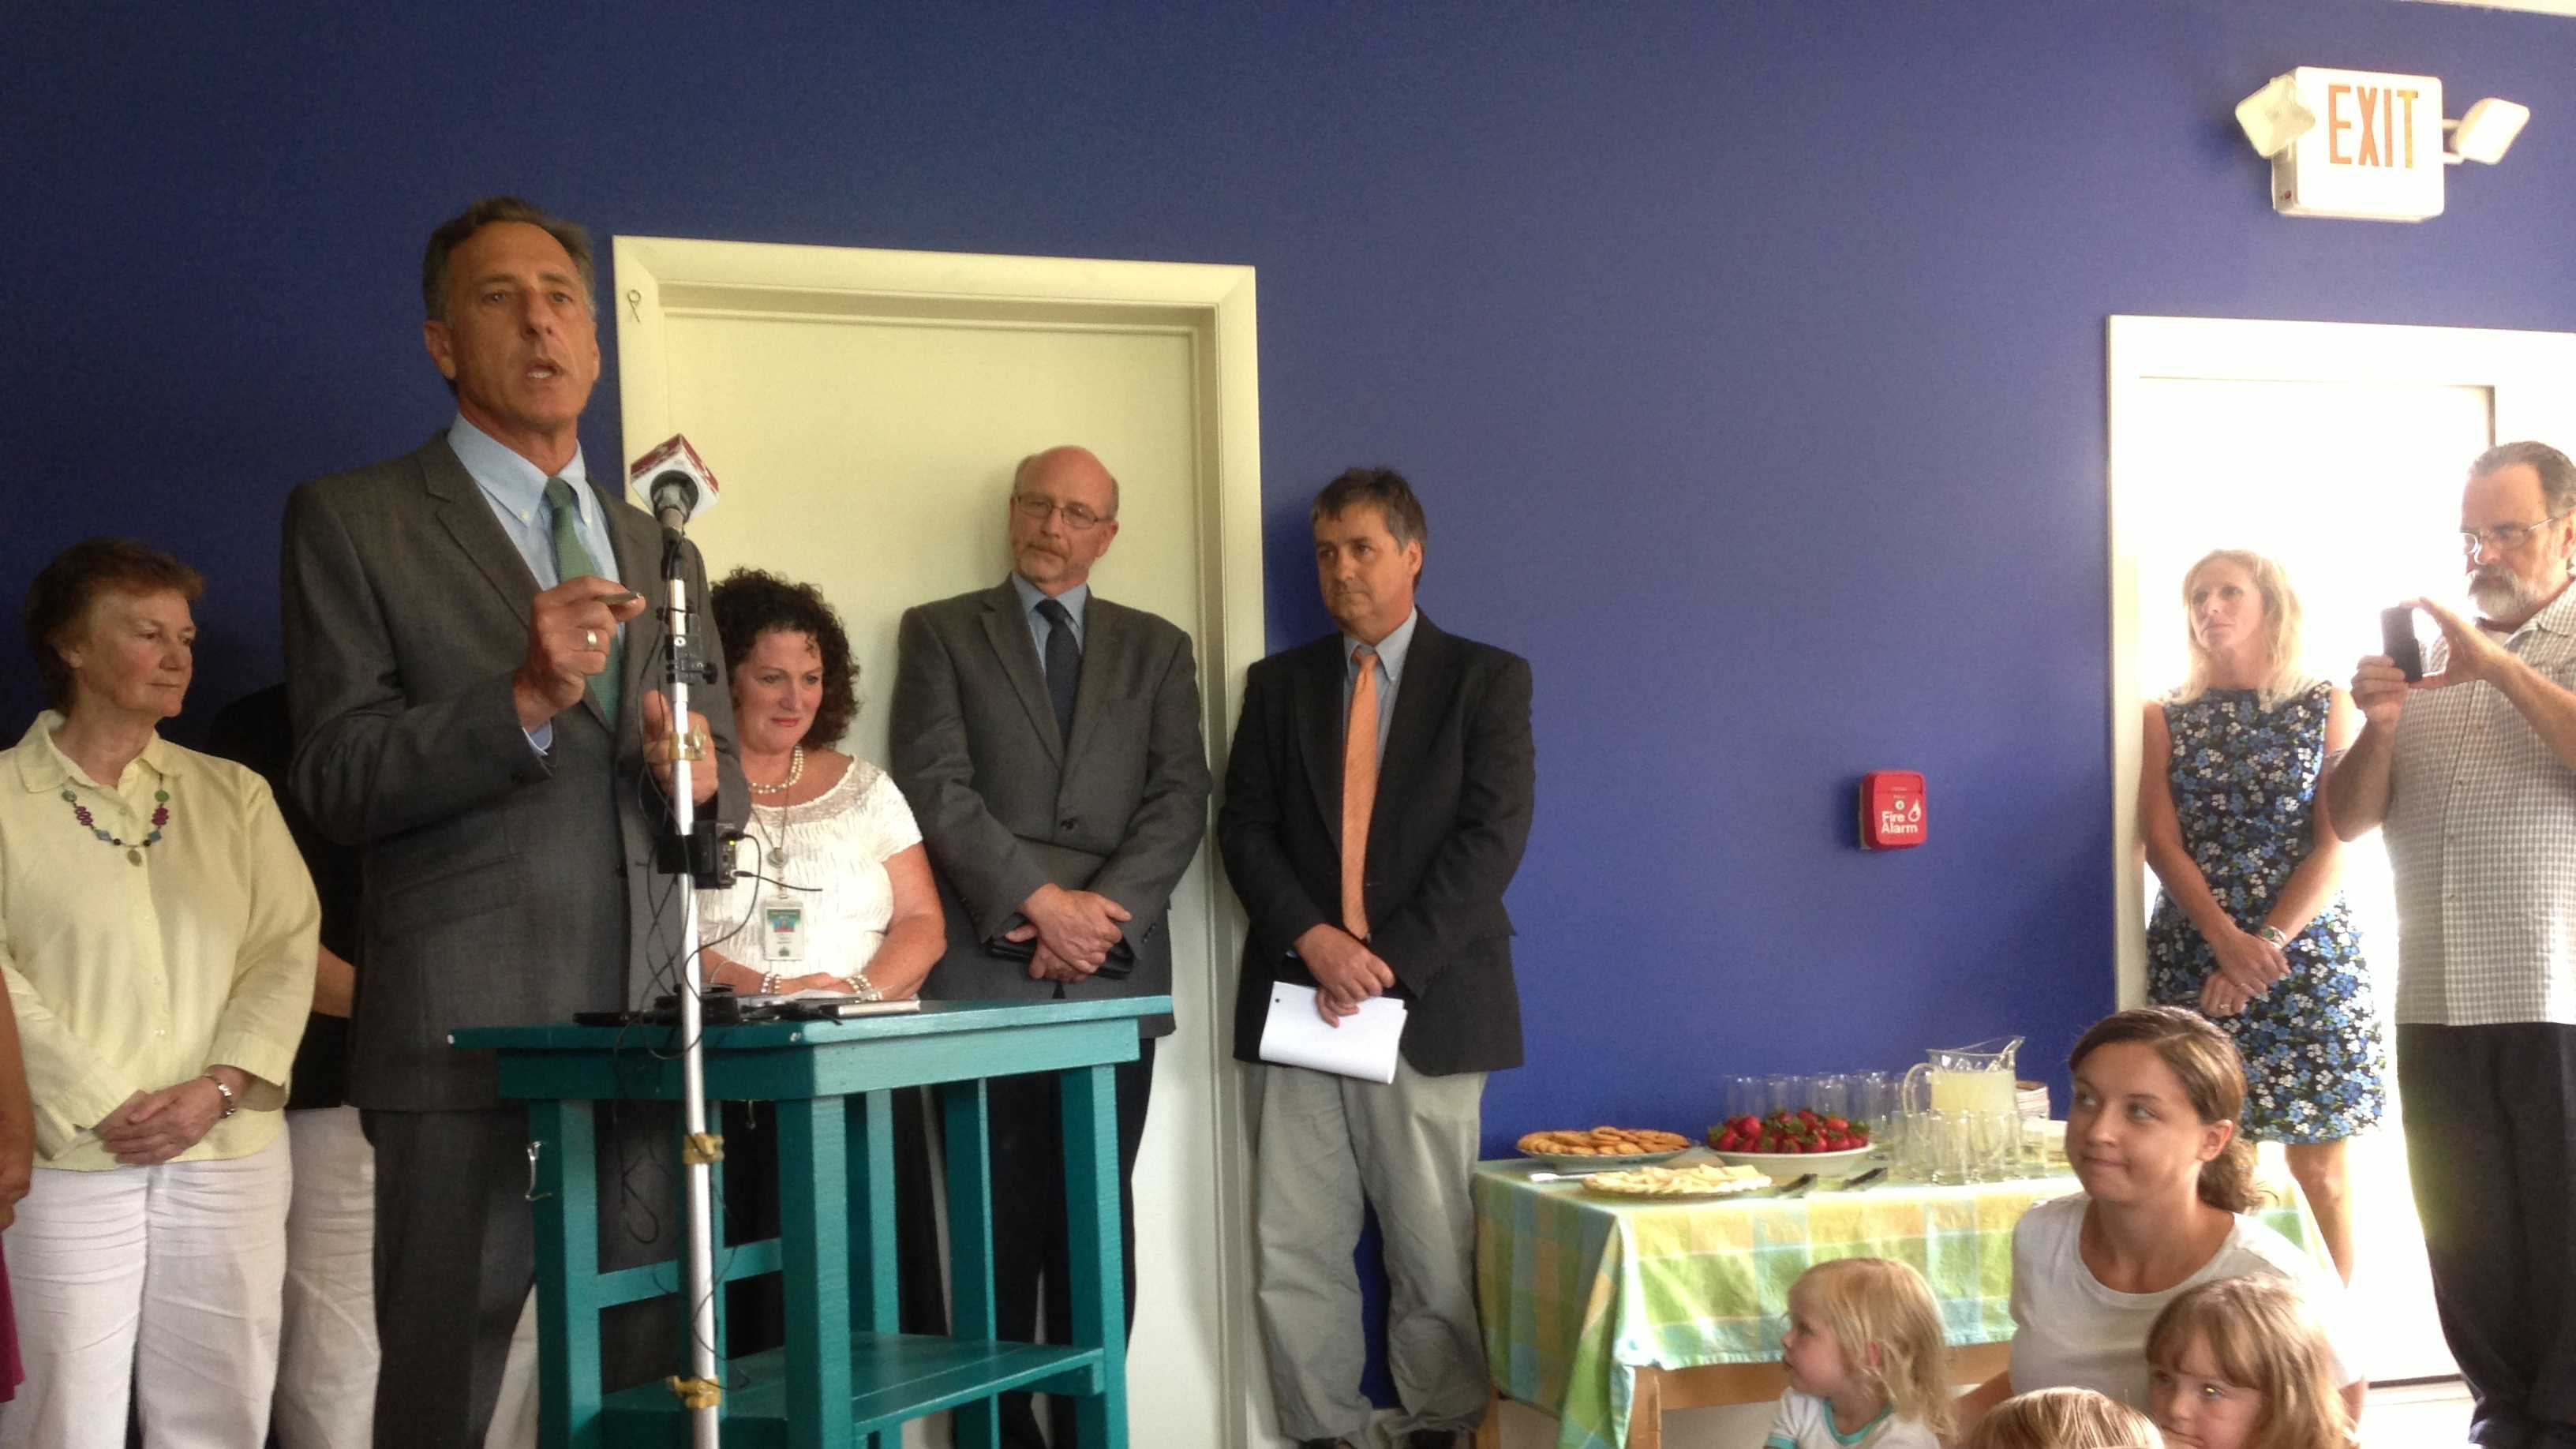 Gov. Shumlin speaks to reporters - and preschool kids - in Williston Wednesday.